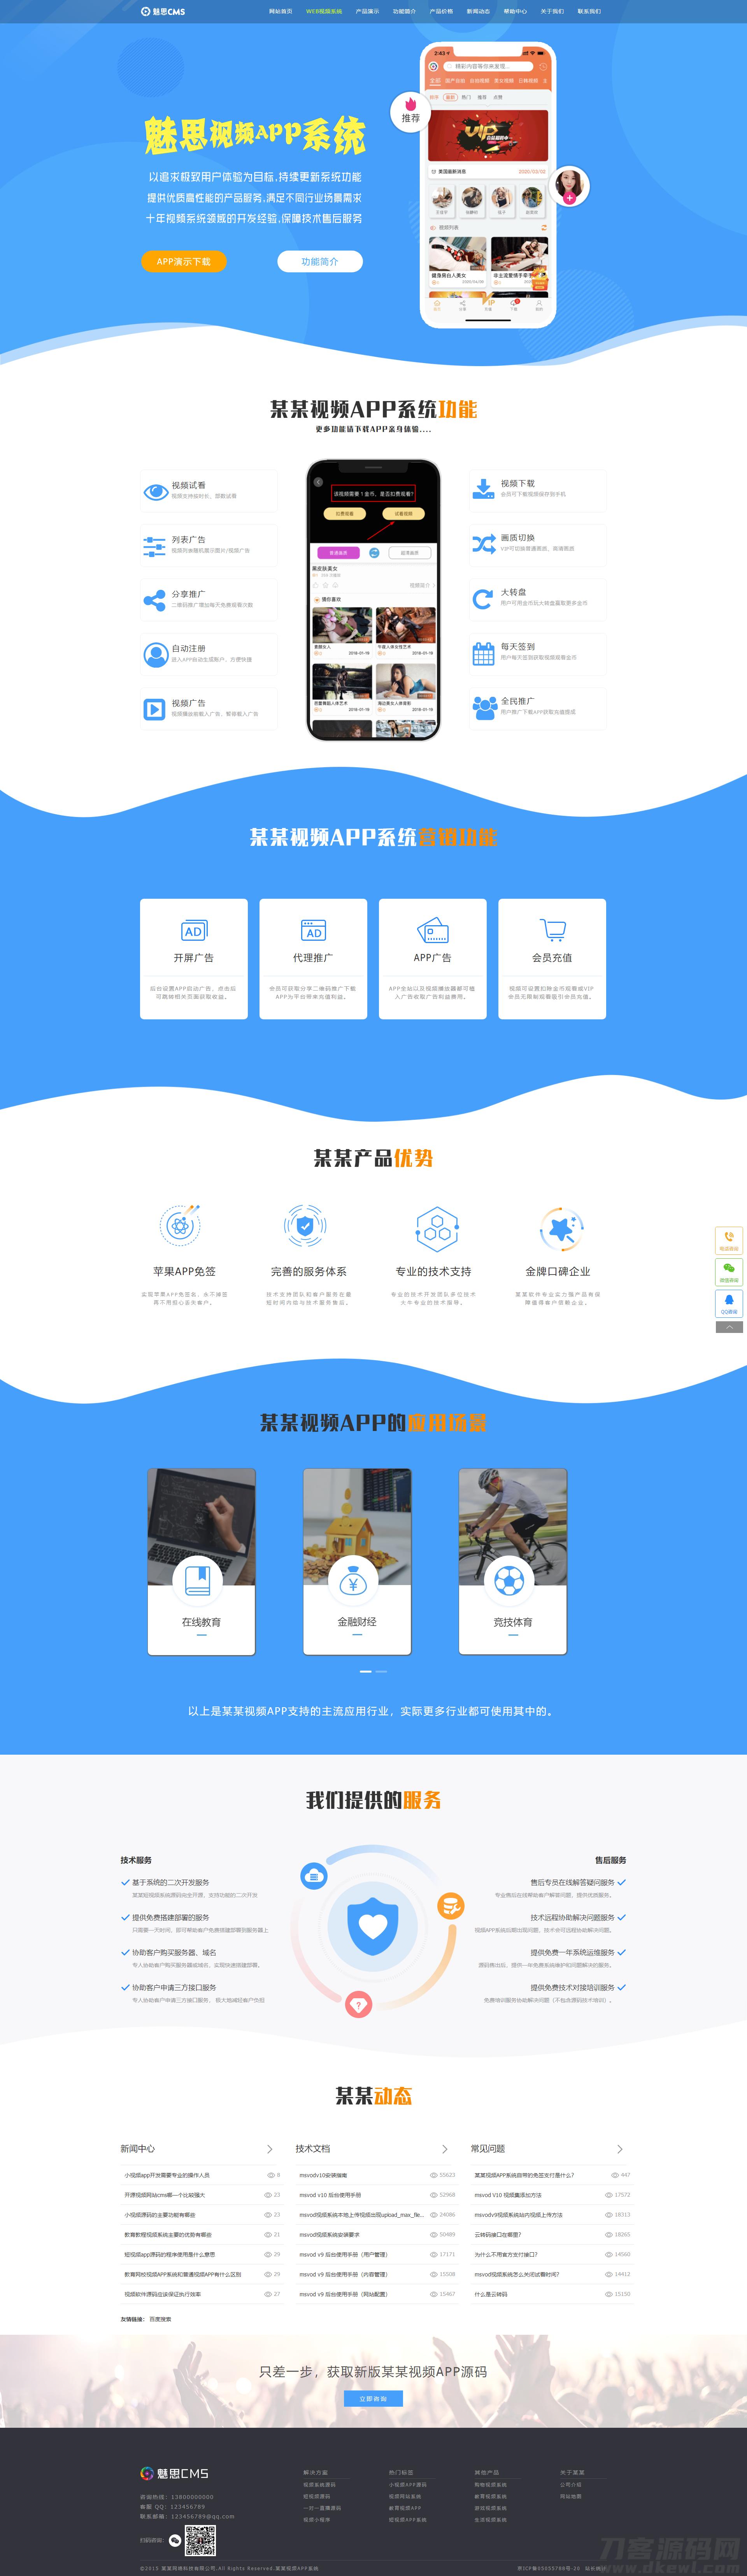 yzmcms仿制魅思视频软件官网_带后台插图